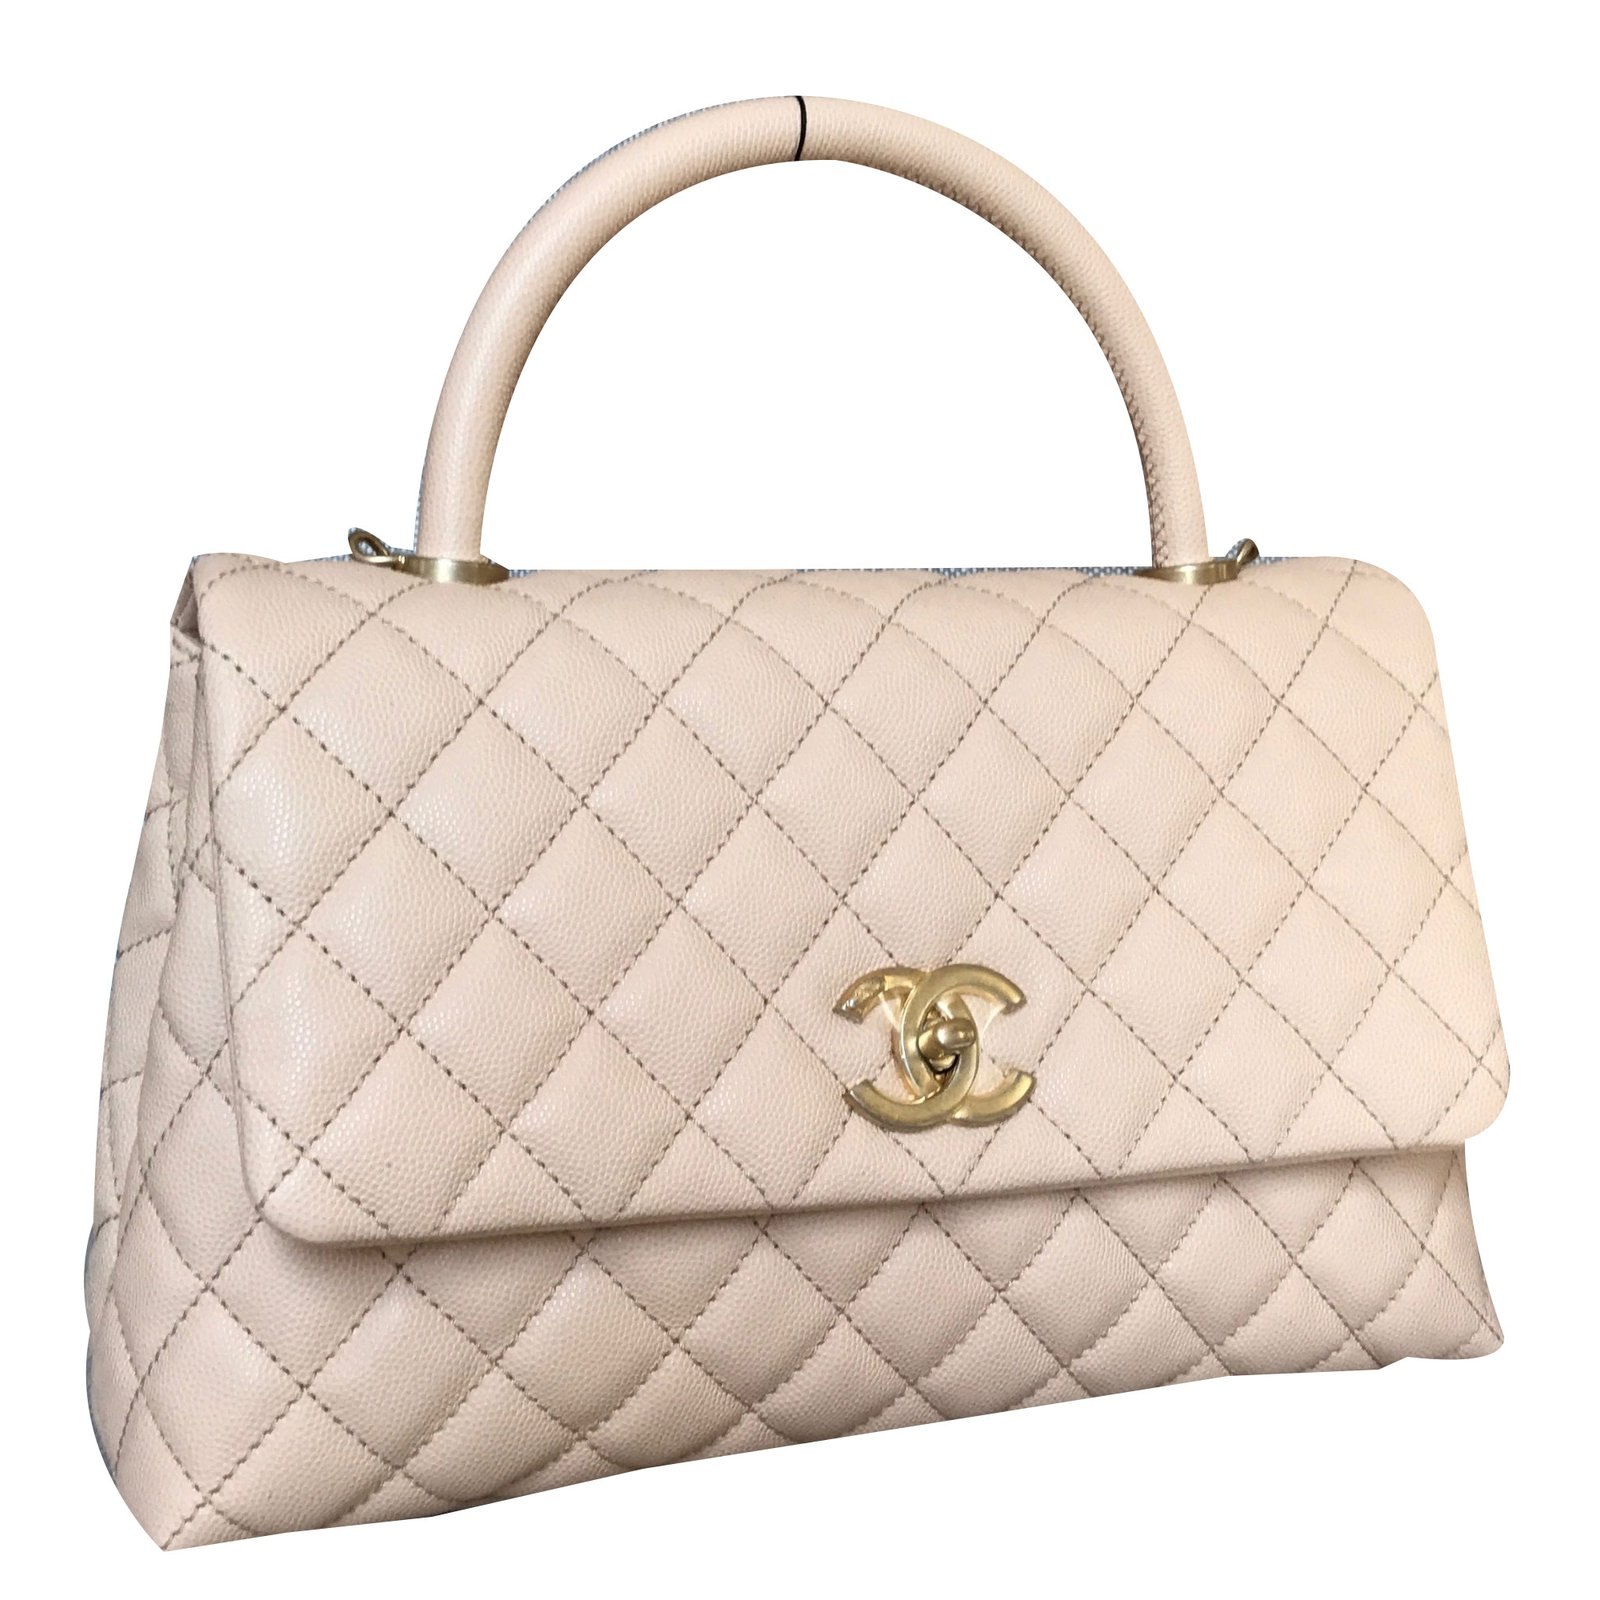 Chanel Coco Handle Handbags Leather Beige ref.38563 - Joli ...